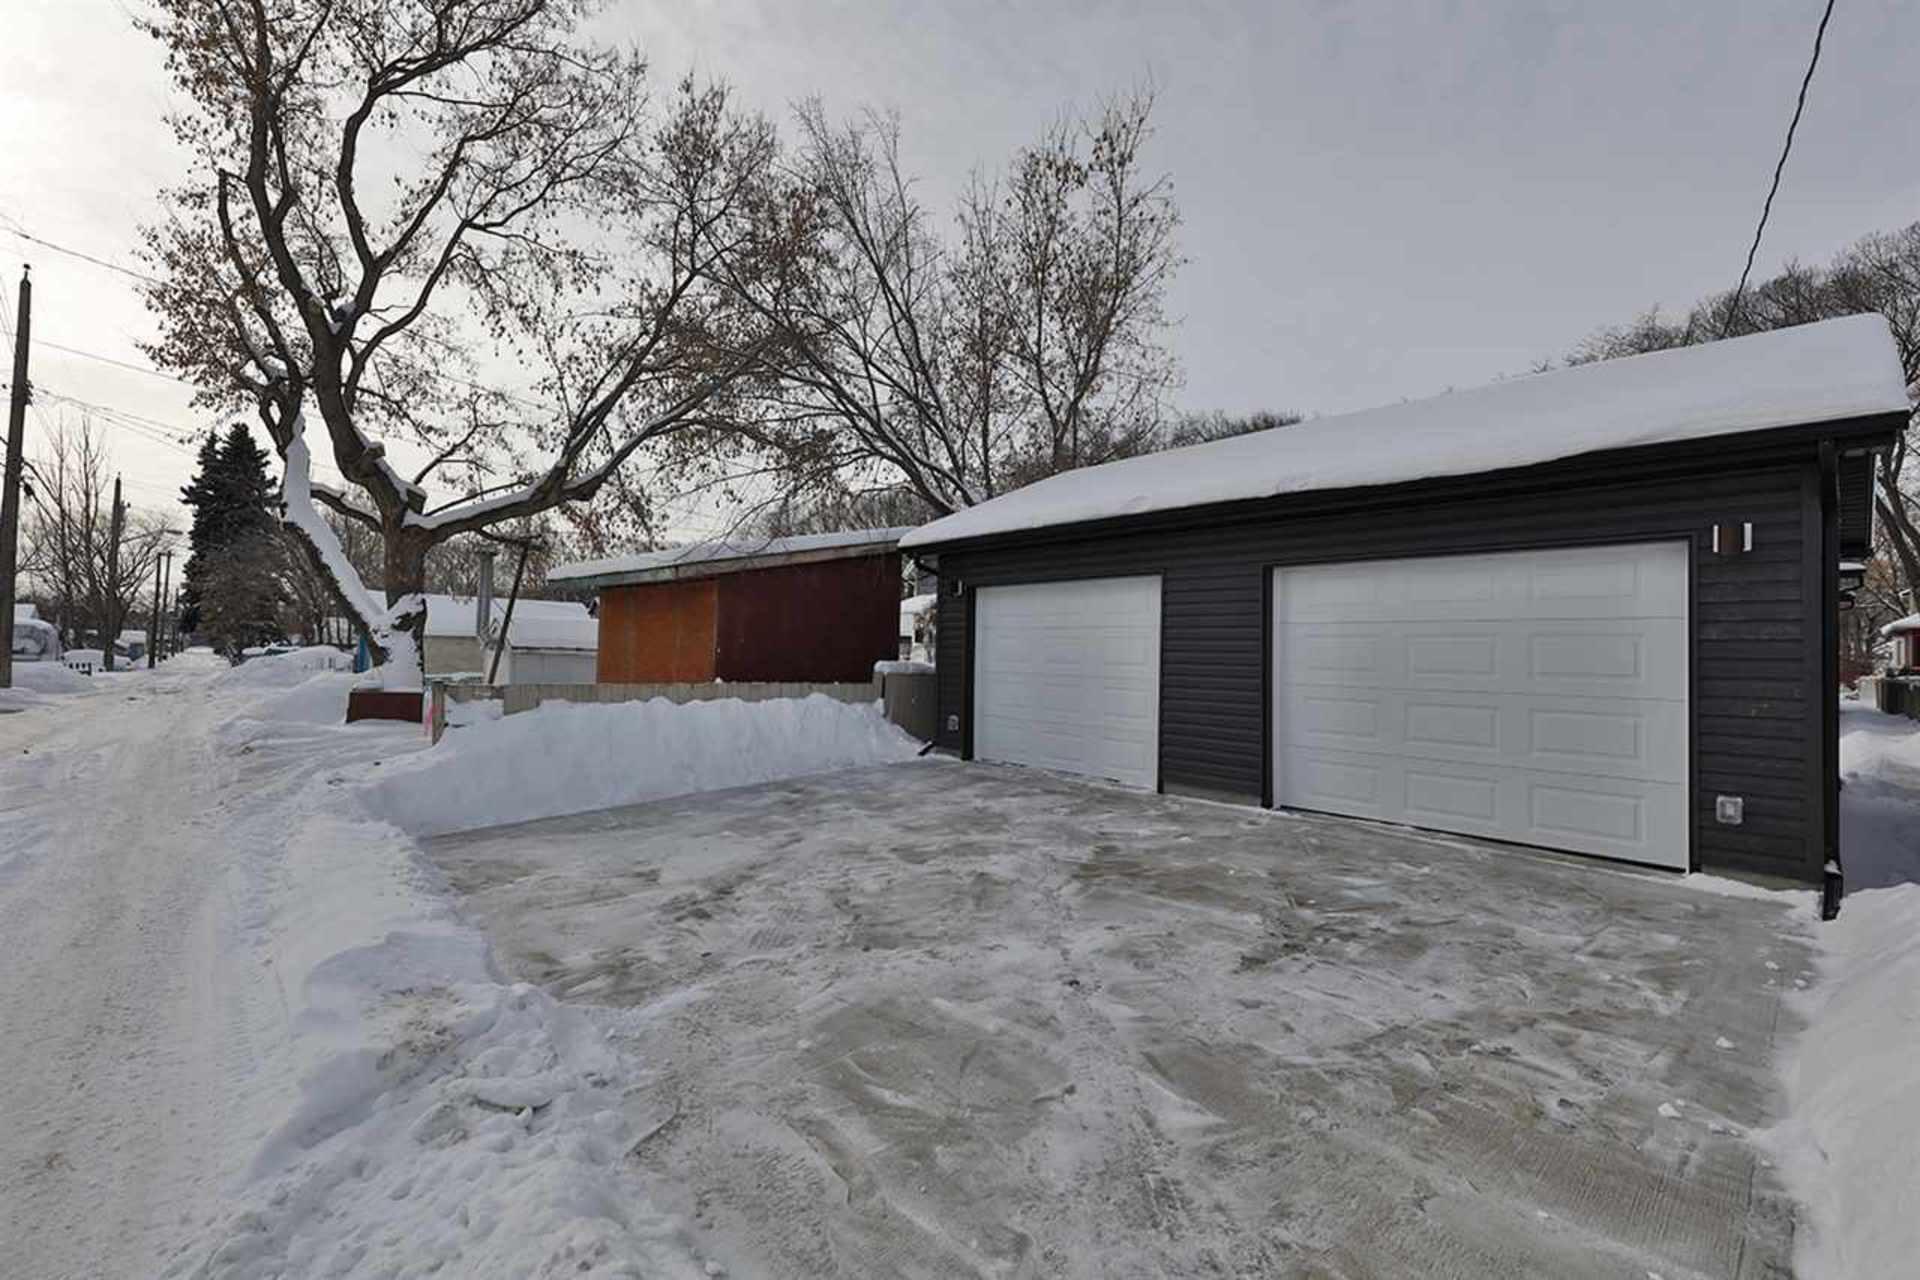 12037-93-street-alberta-avenue-edmonton-13 at 12037 93 Street, Alberta Avenue, Edmonton